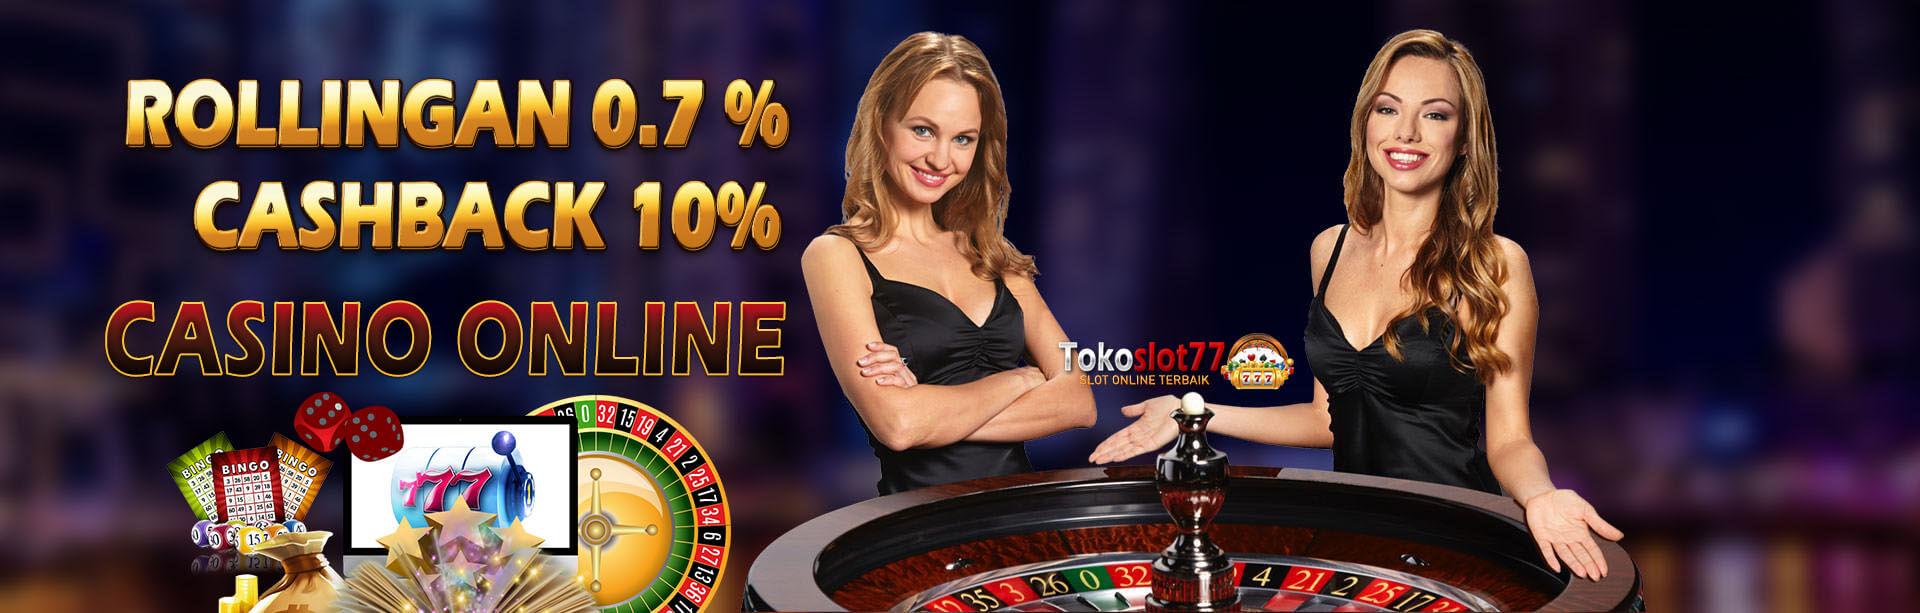 Bonus casino online tokoslot77